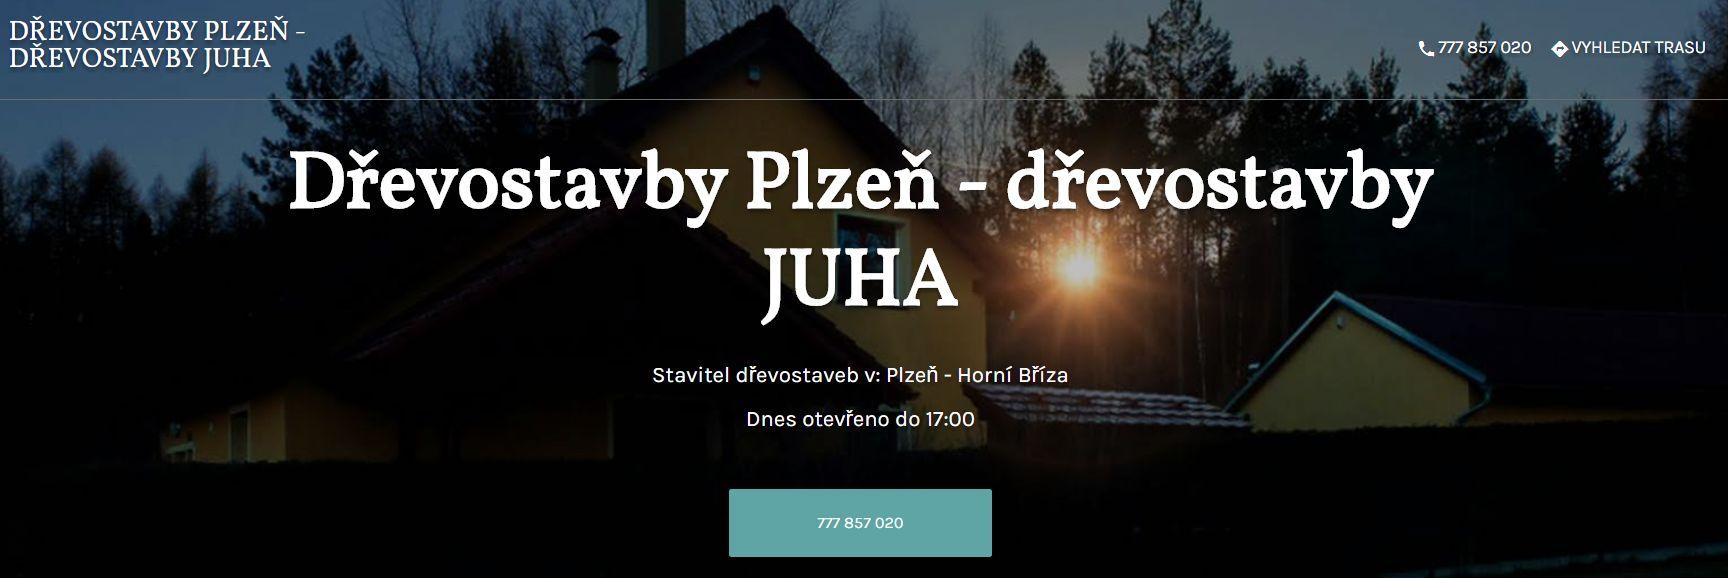 Dřevostavby - výstavba dřevostaveb v Plzni